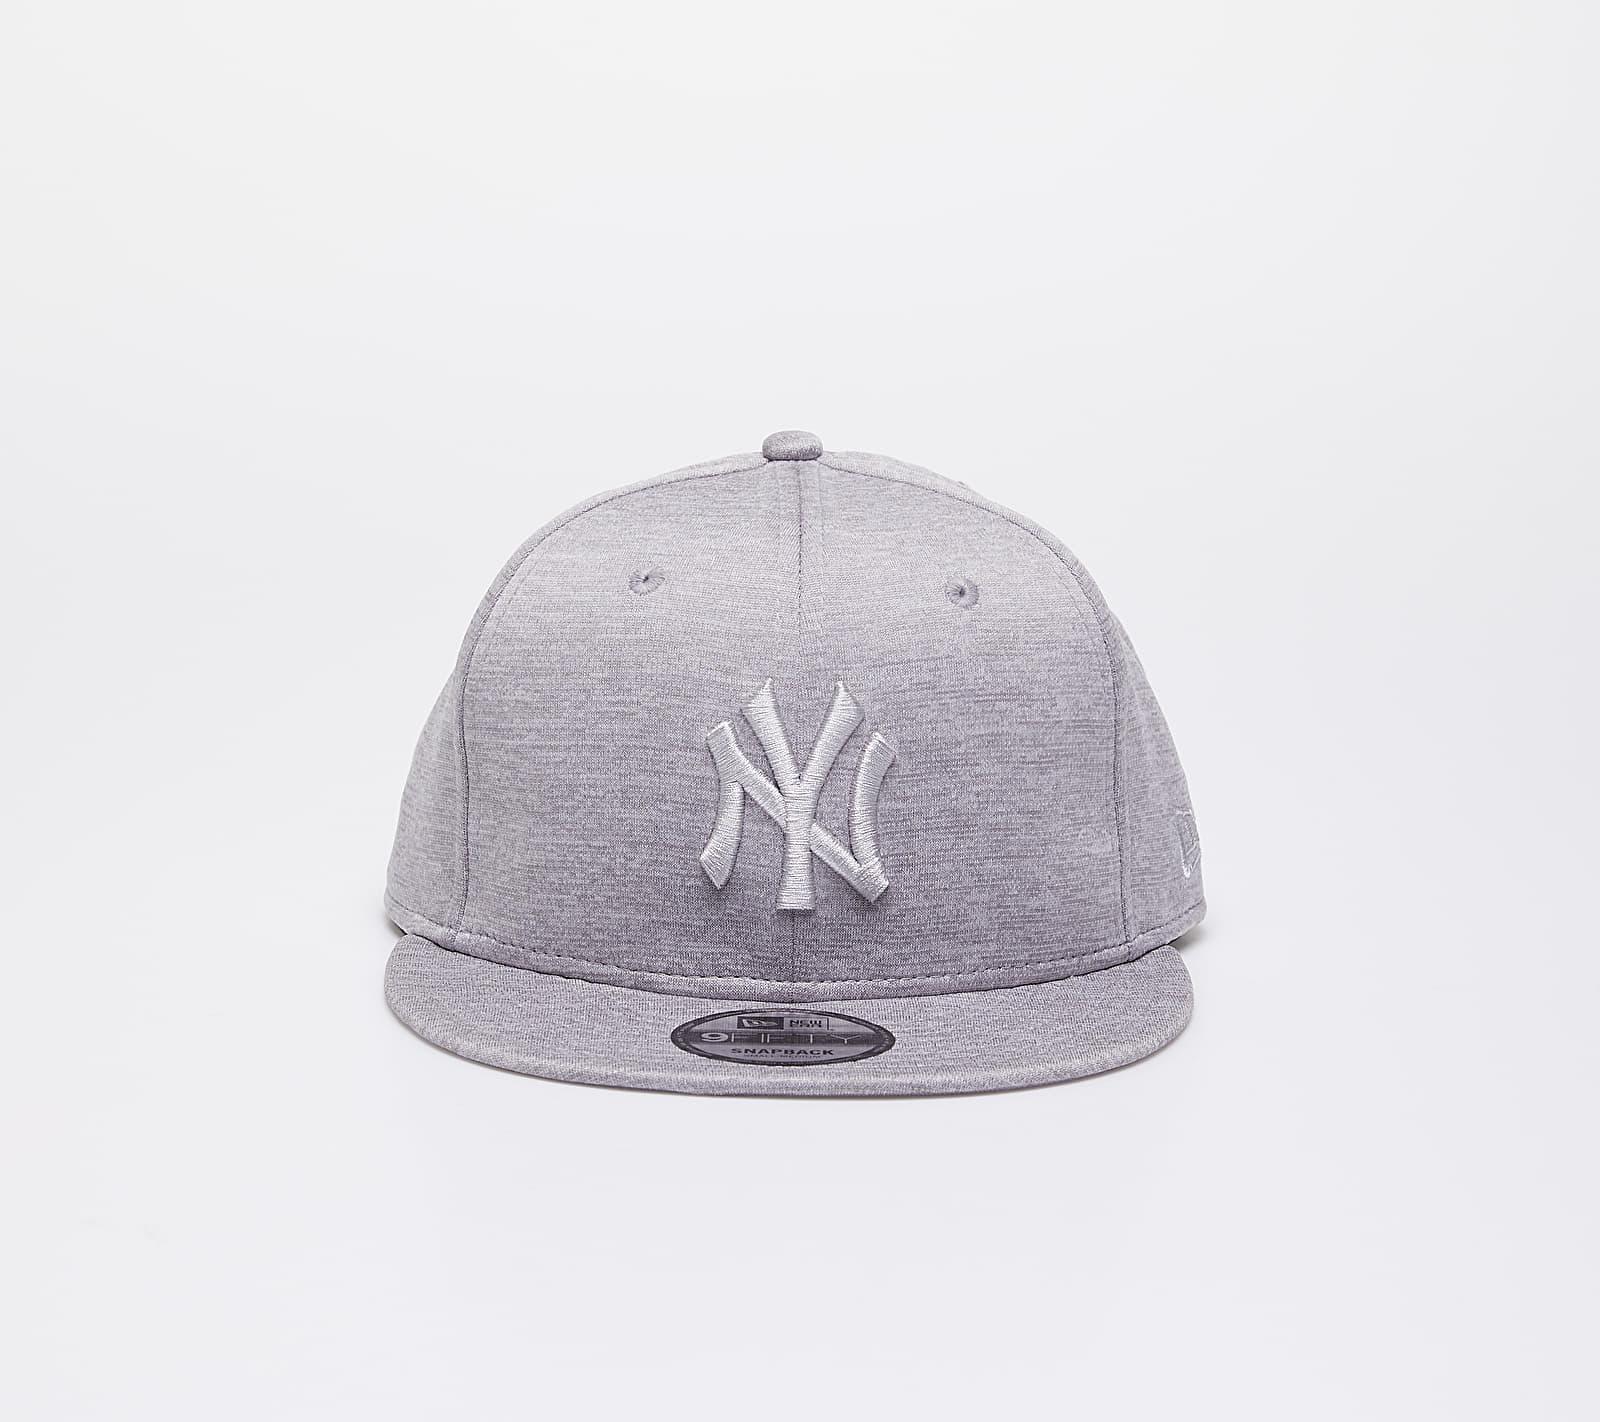 New Era 9Fifty MLB Shadow Tech New York Yankees Cap Grey S-M